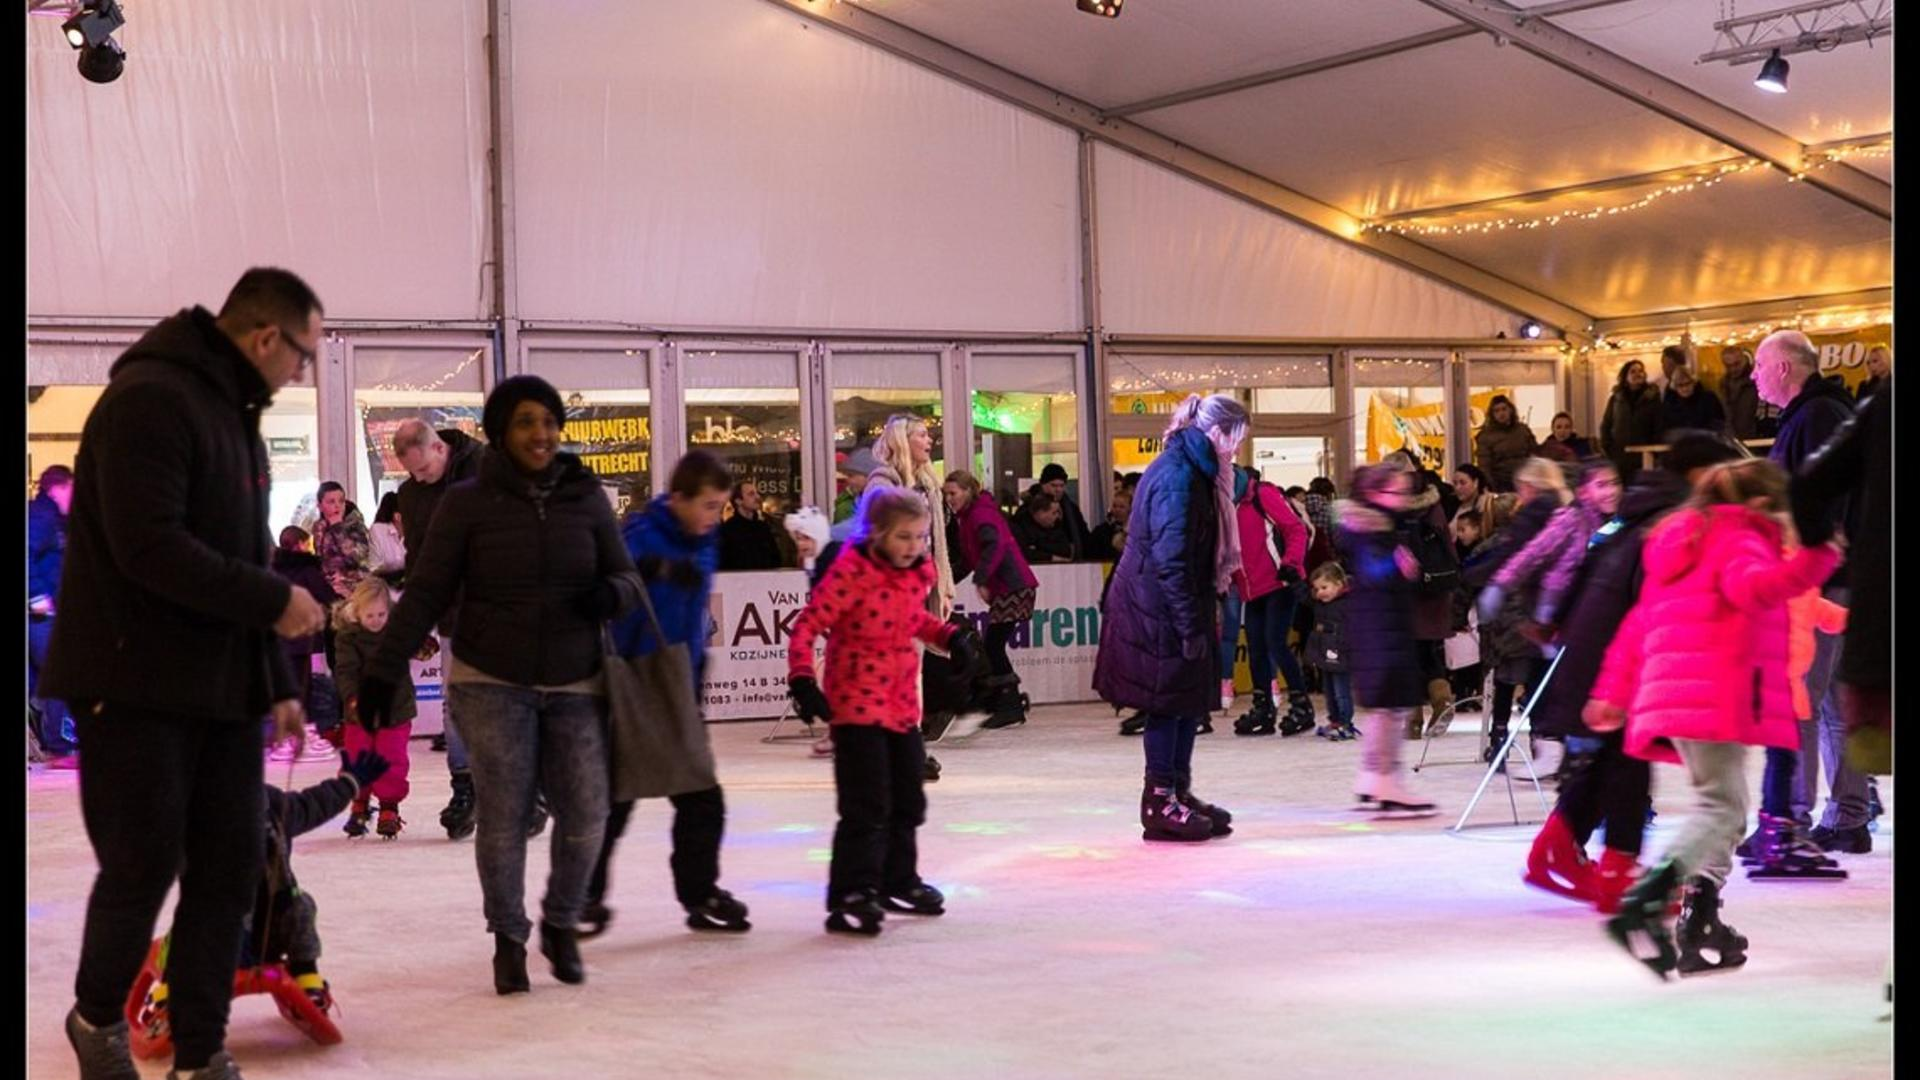 opening-schaatsbaan-bc-klein-scheveningen-2017-44-1140p-1.jpg